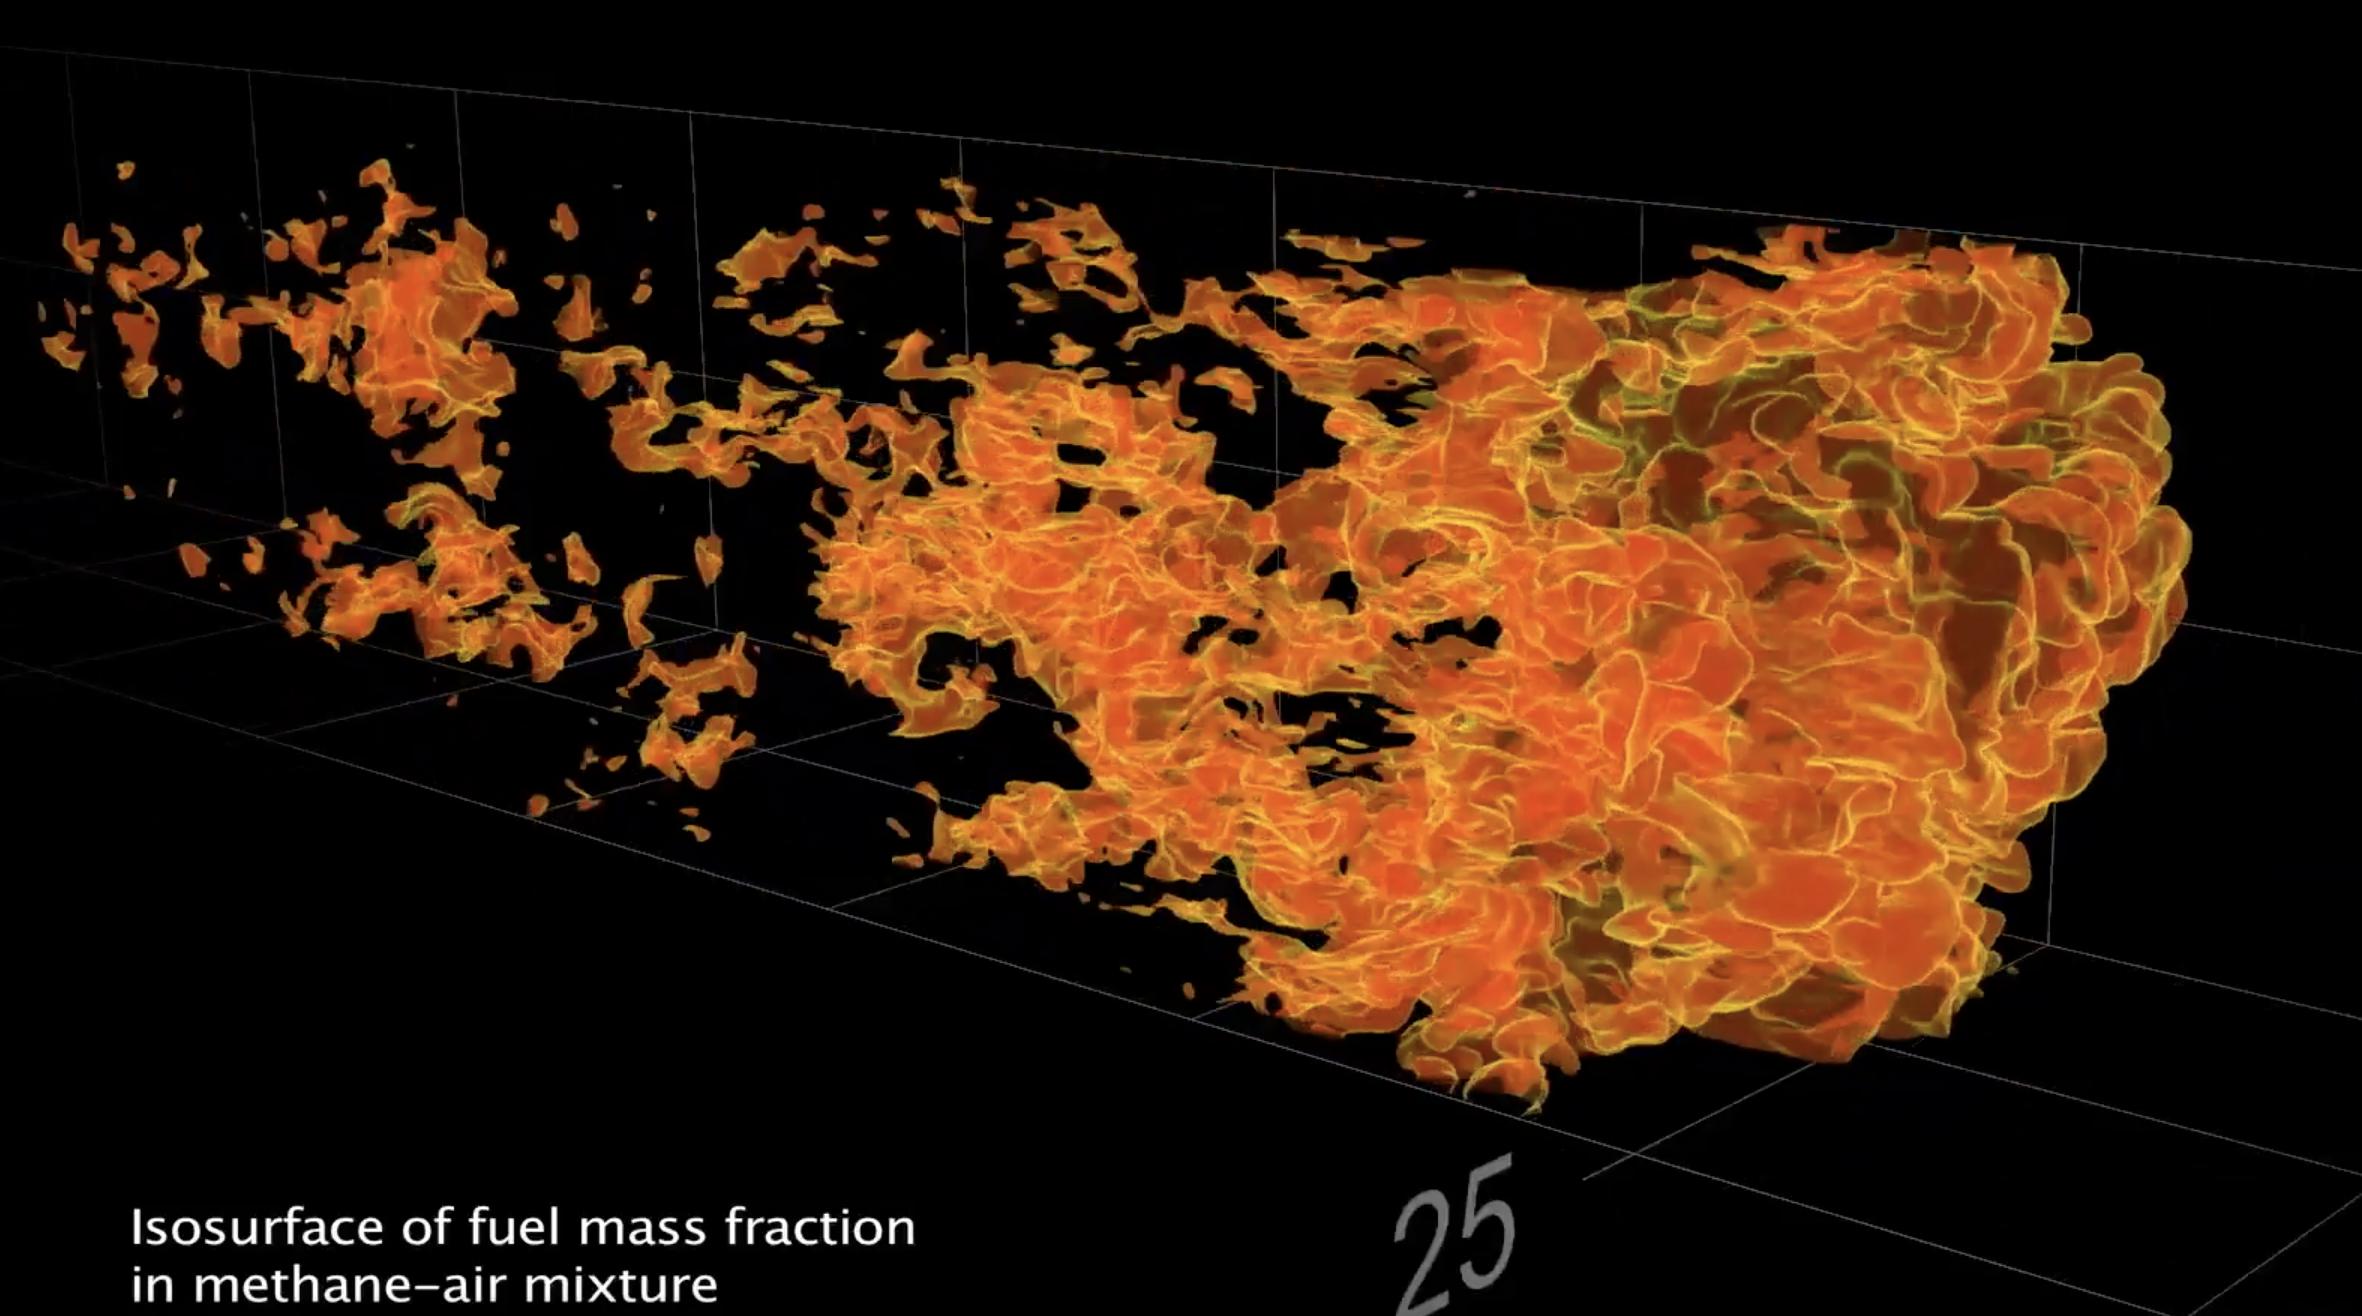 The Big Bang Probably Happened Because of Turbulence